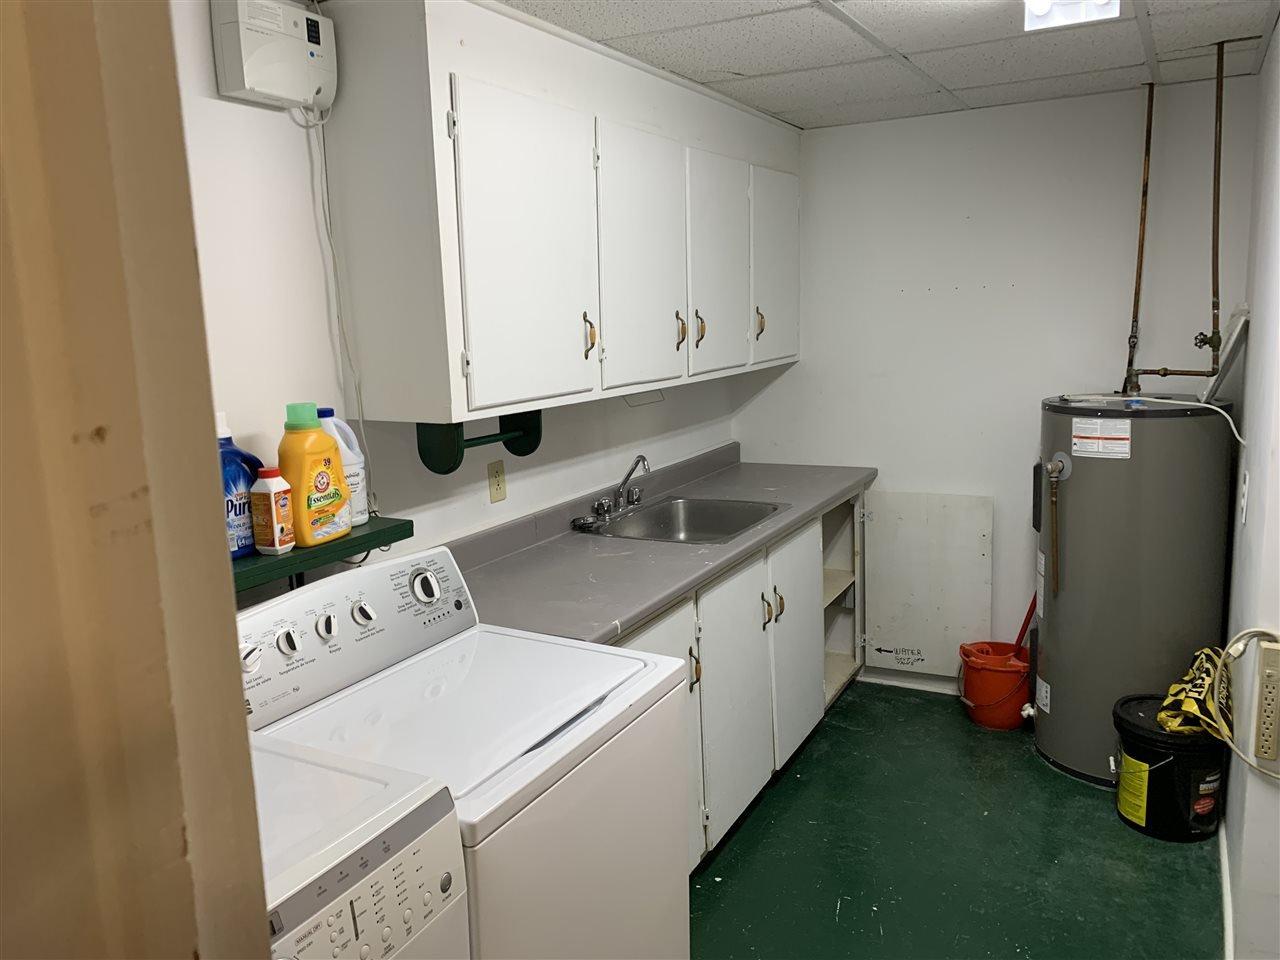 Photo 7: Photos: 8 Emily Court in Lower Sackville: 25-Sackville Residential for sale (Halifax-Dartmouth)  : MLS®# 202008626